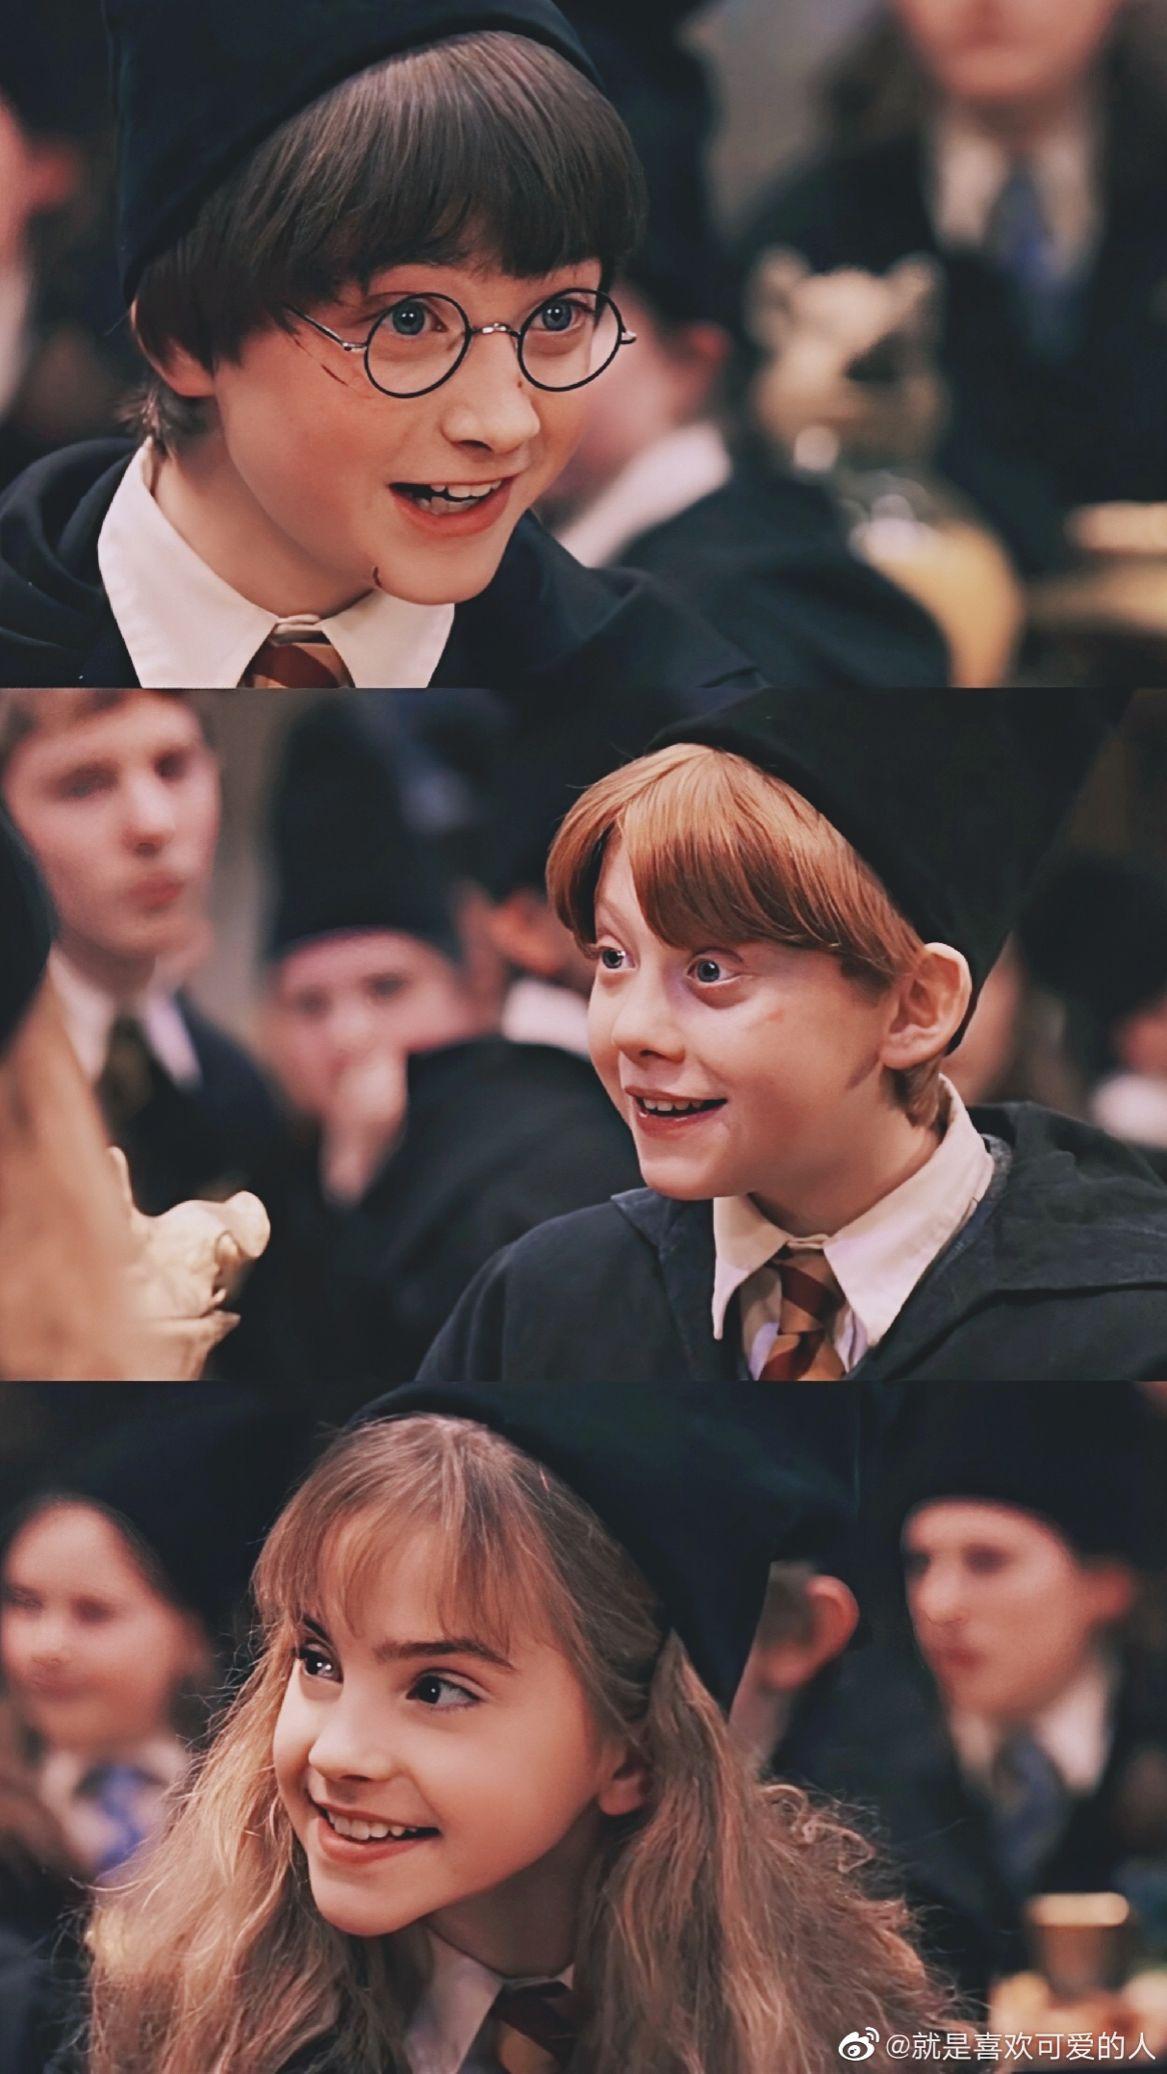 #DanielRadcliffe #HarryPotter #EmmaWatson #HermioneGranger #RupertGrint #RonWeasley #TomFelton #DracoMalfoy #JKRowling #phùThuỷ #bộ3 #7part